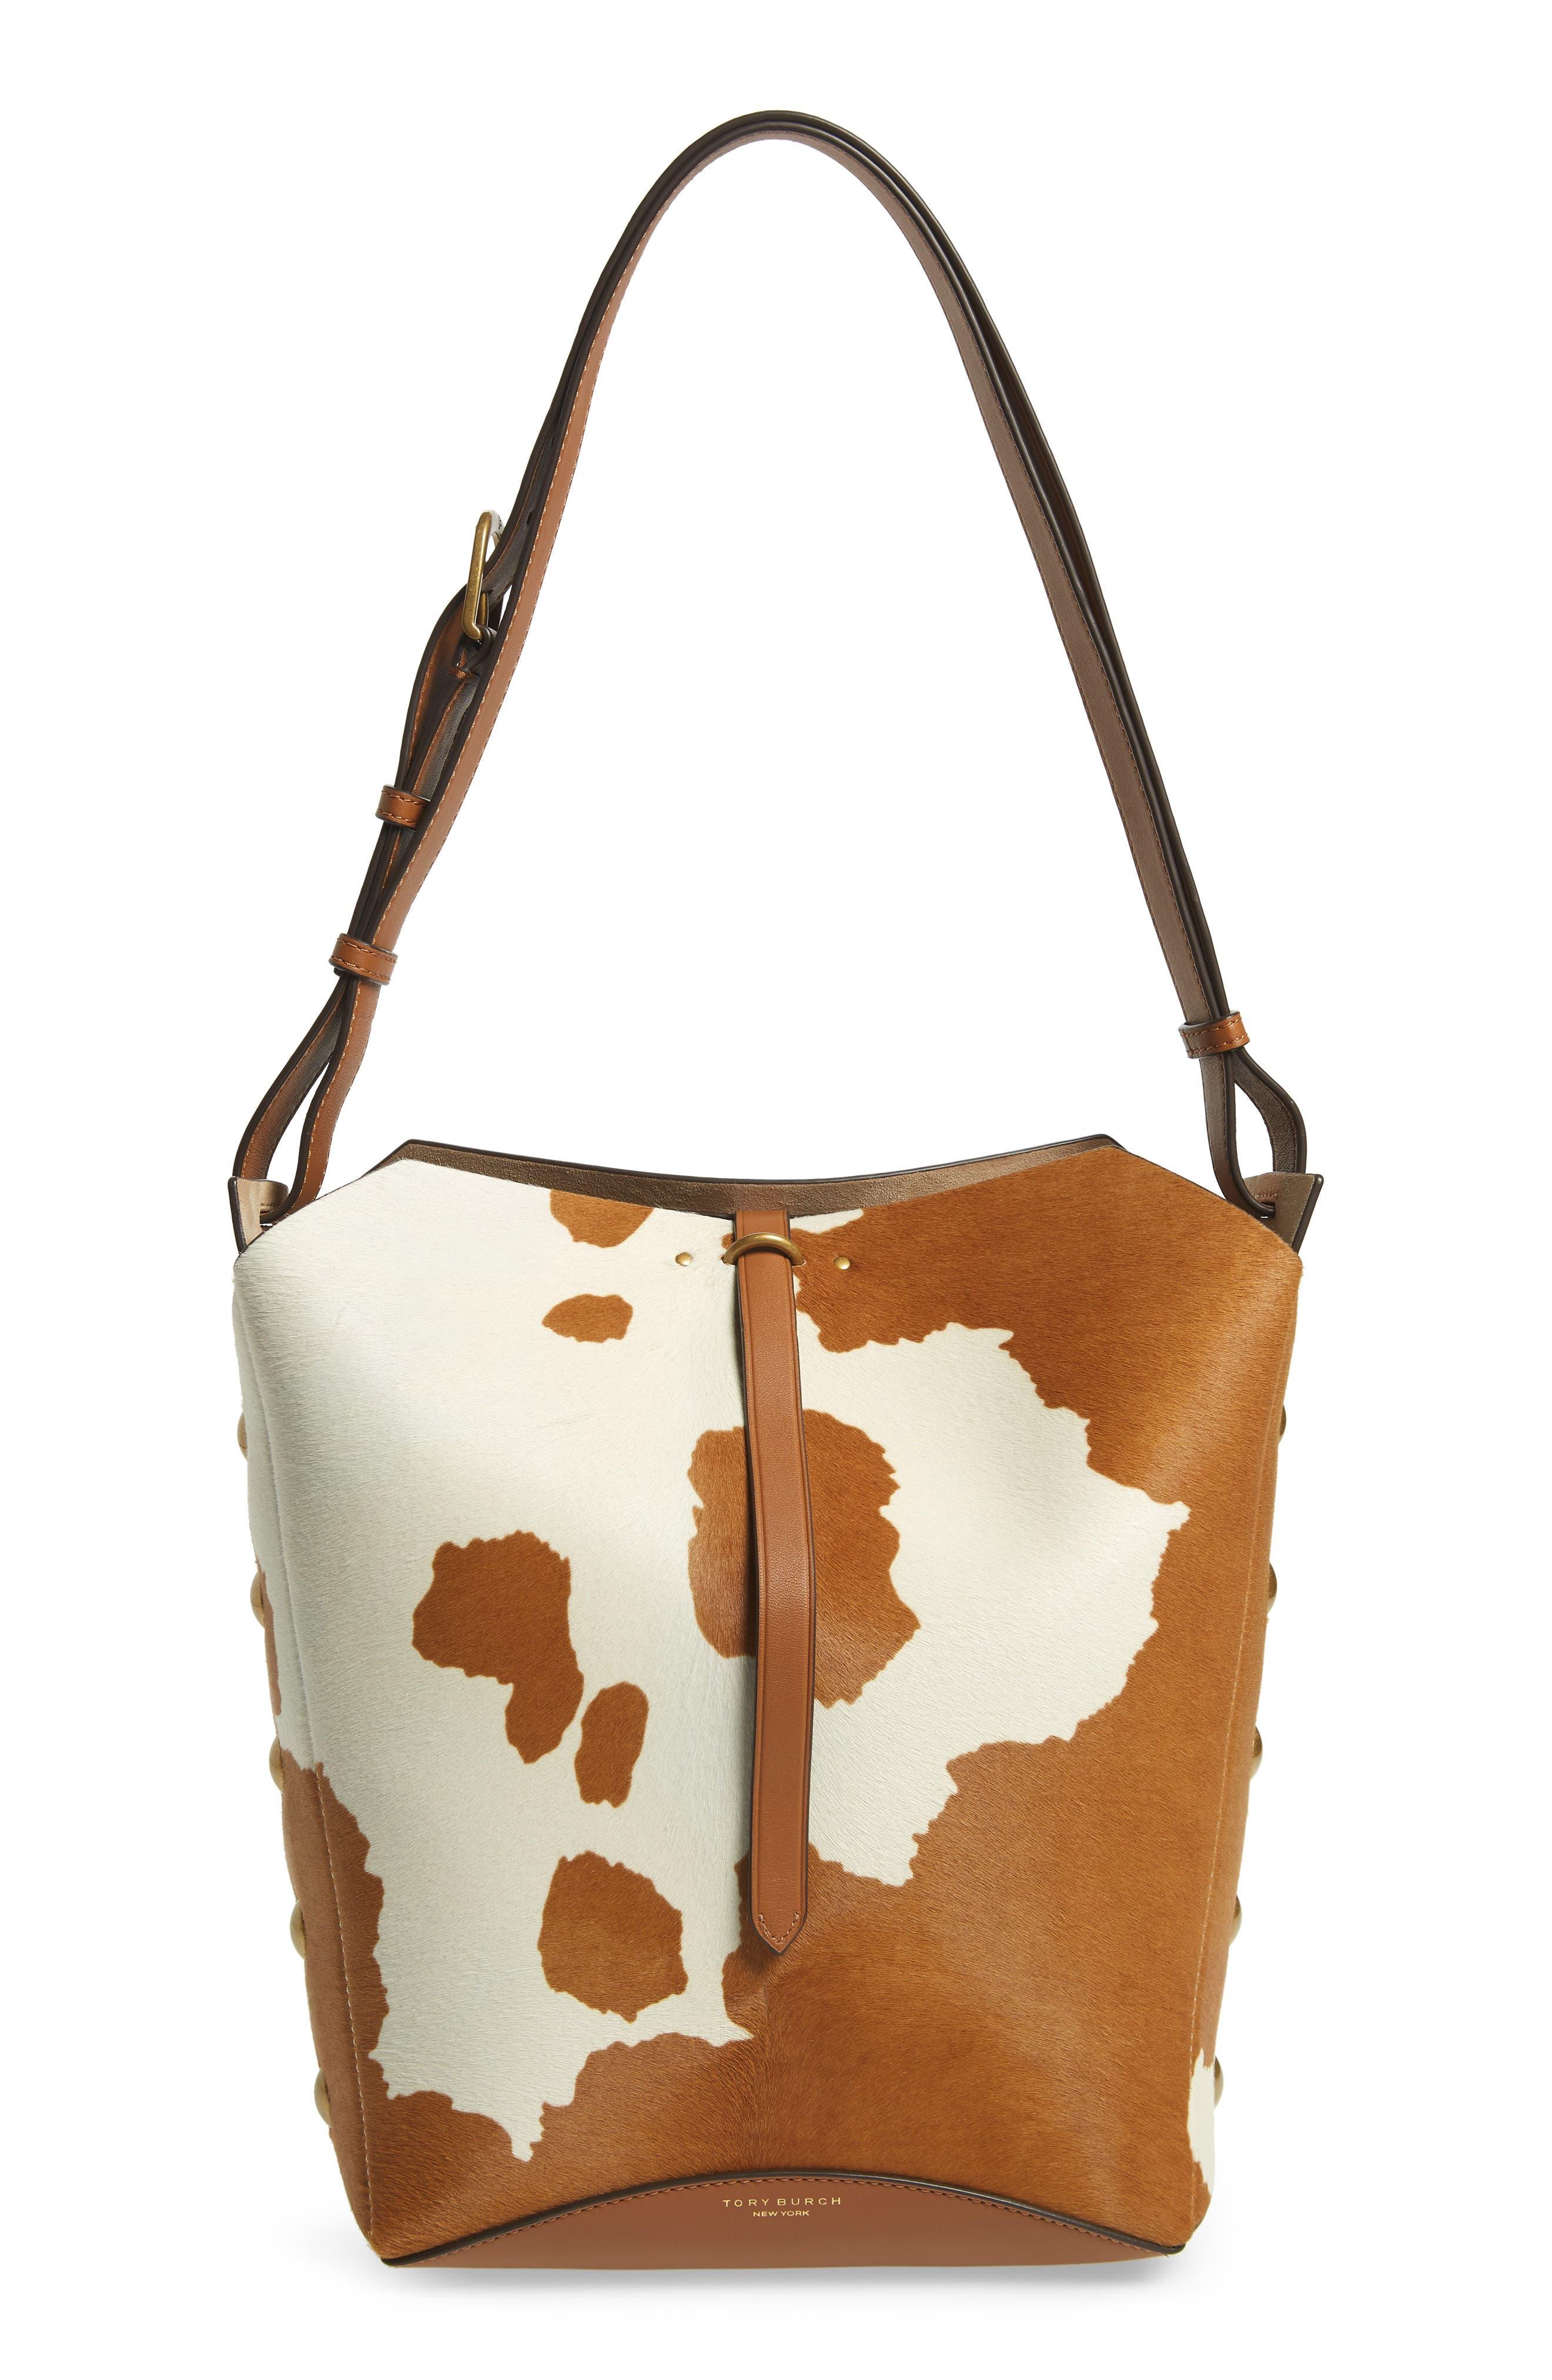 dbe3ad58 Calf Hair Handbags & Wallets for Women   Nordstrom